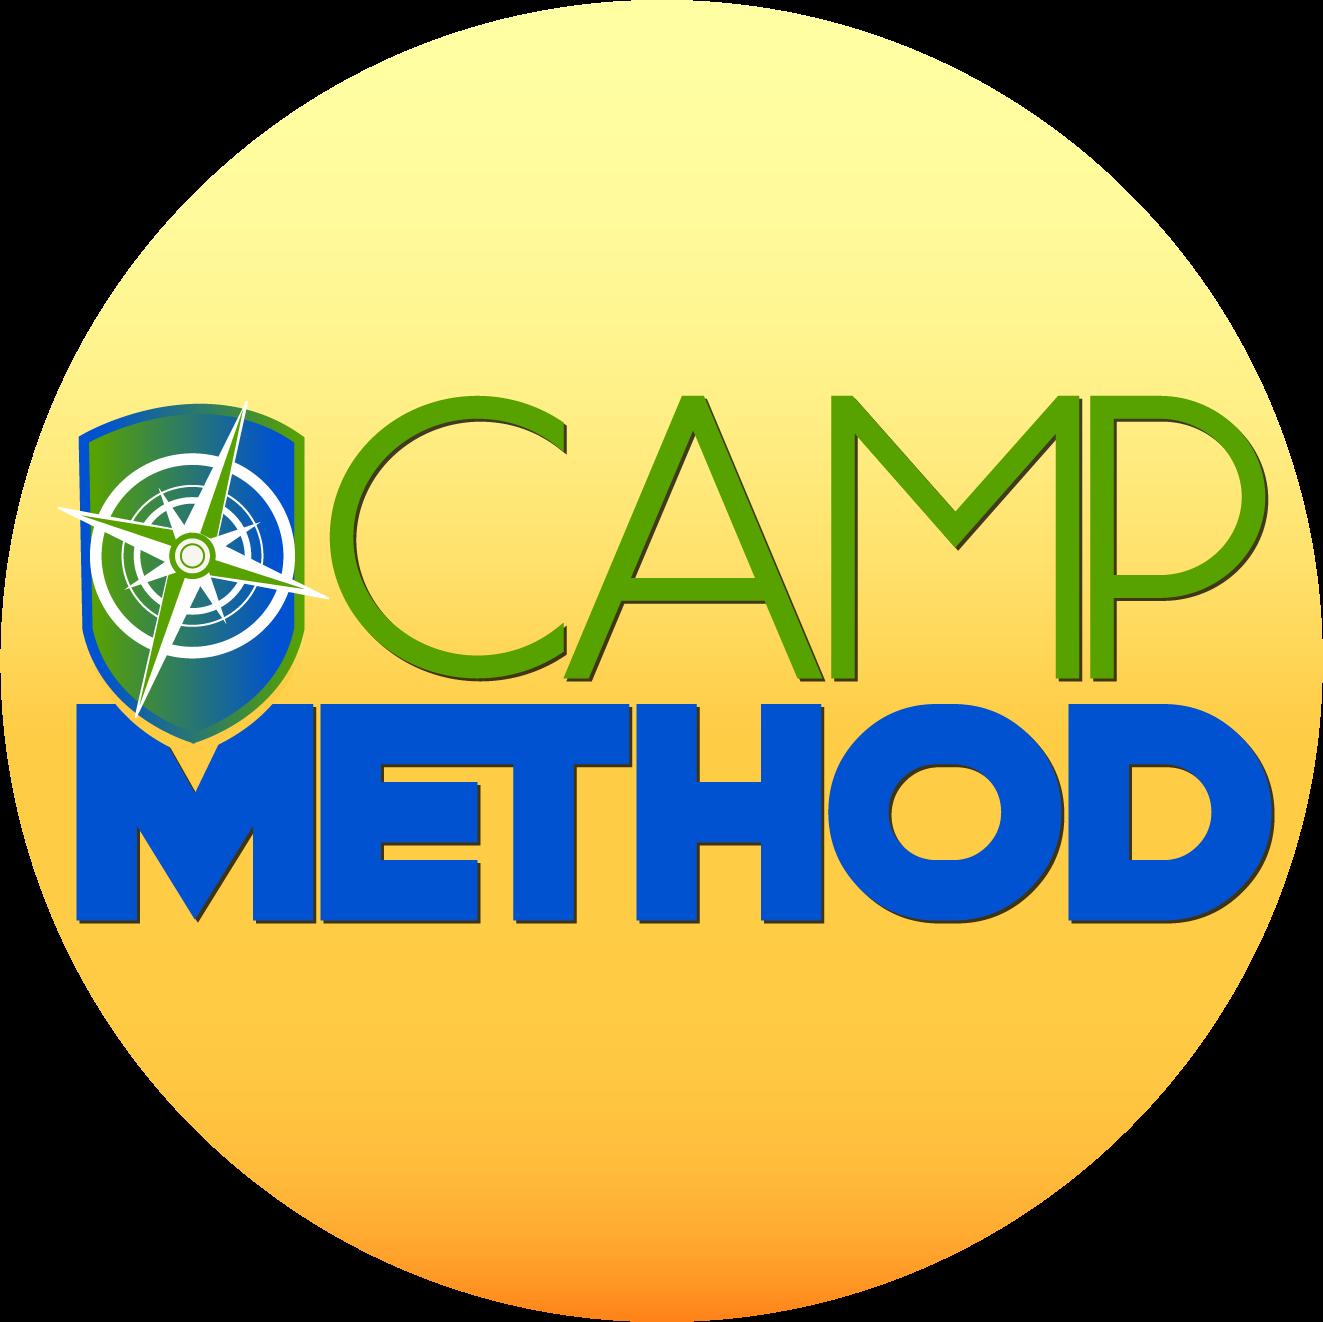 Camp Method